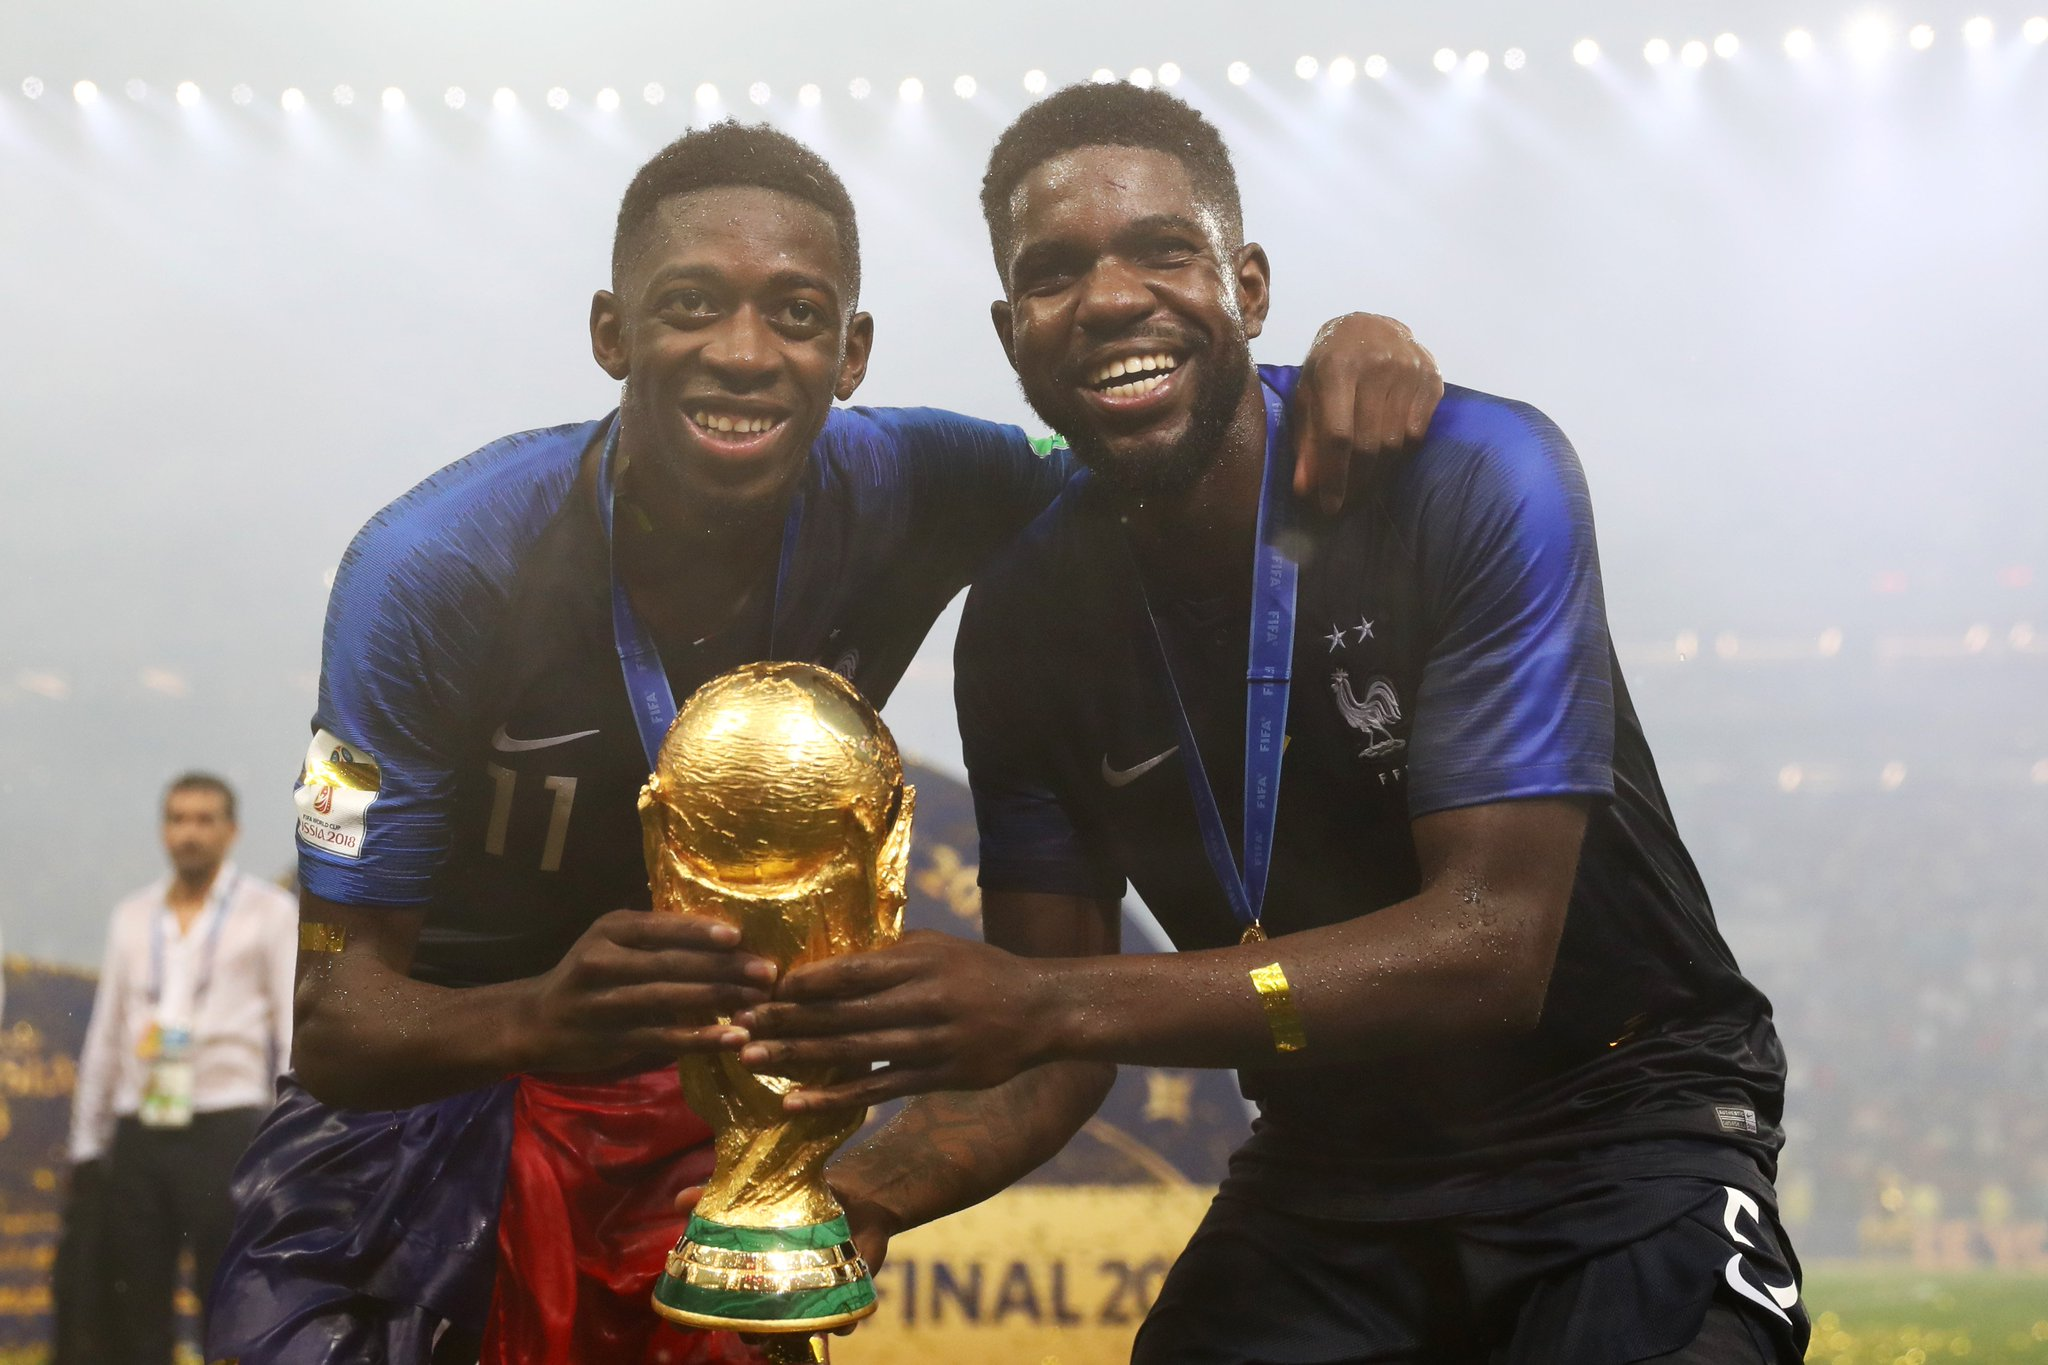 �� #WorldCup winners! �� @Dembouz & @samumtiti ���� #BarçaWorldCup https://t.co/TocLLOG9zd